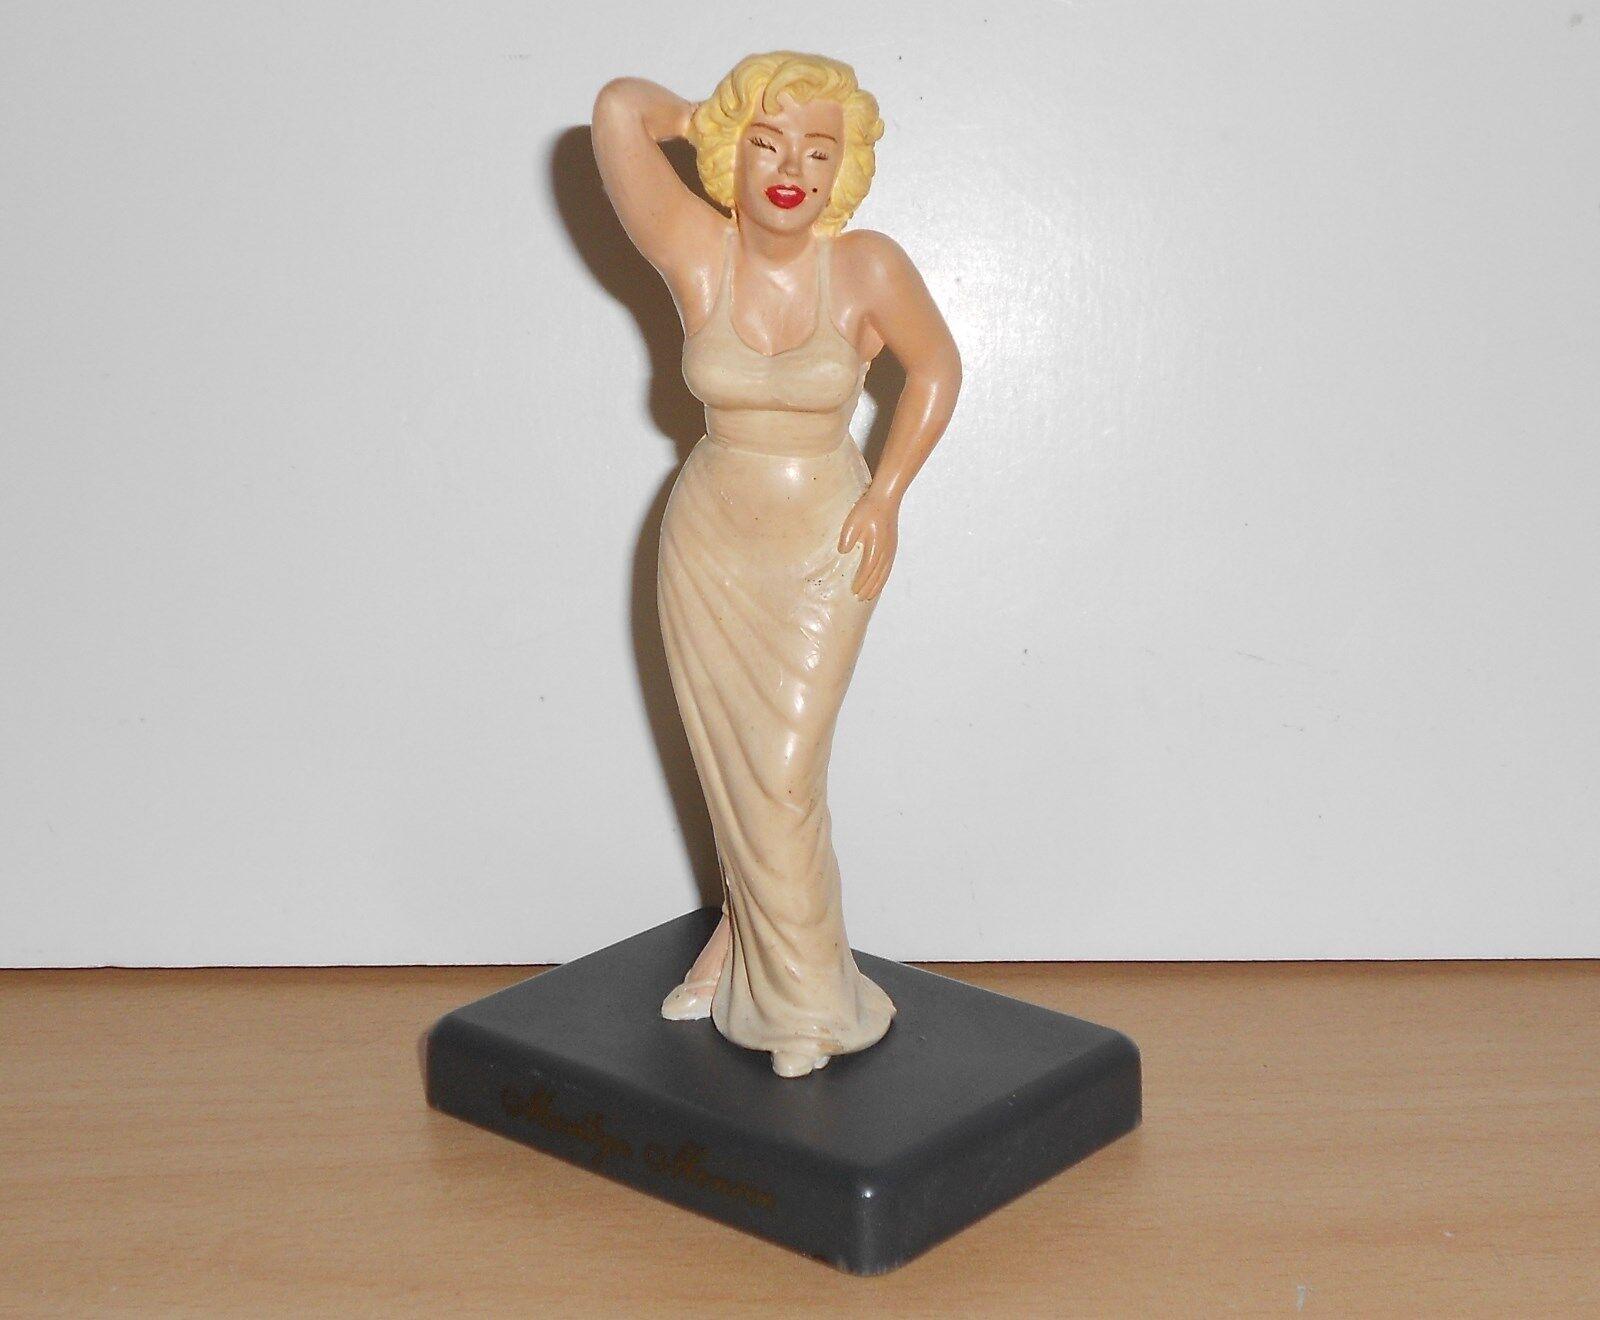 MARILYN MONROE PVC FIGURINE Figure limited edition 5  Tall Tall Tall Hard Rubber 1994 e49d2c